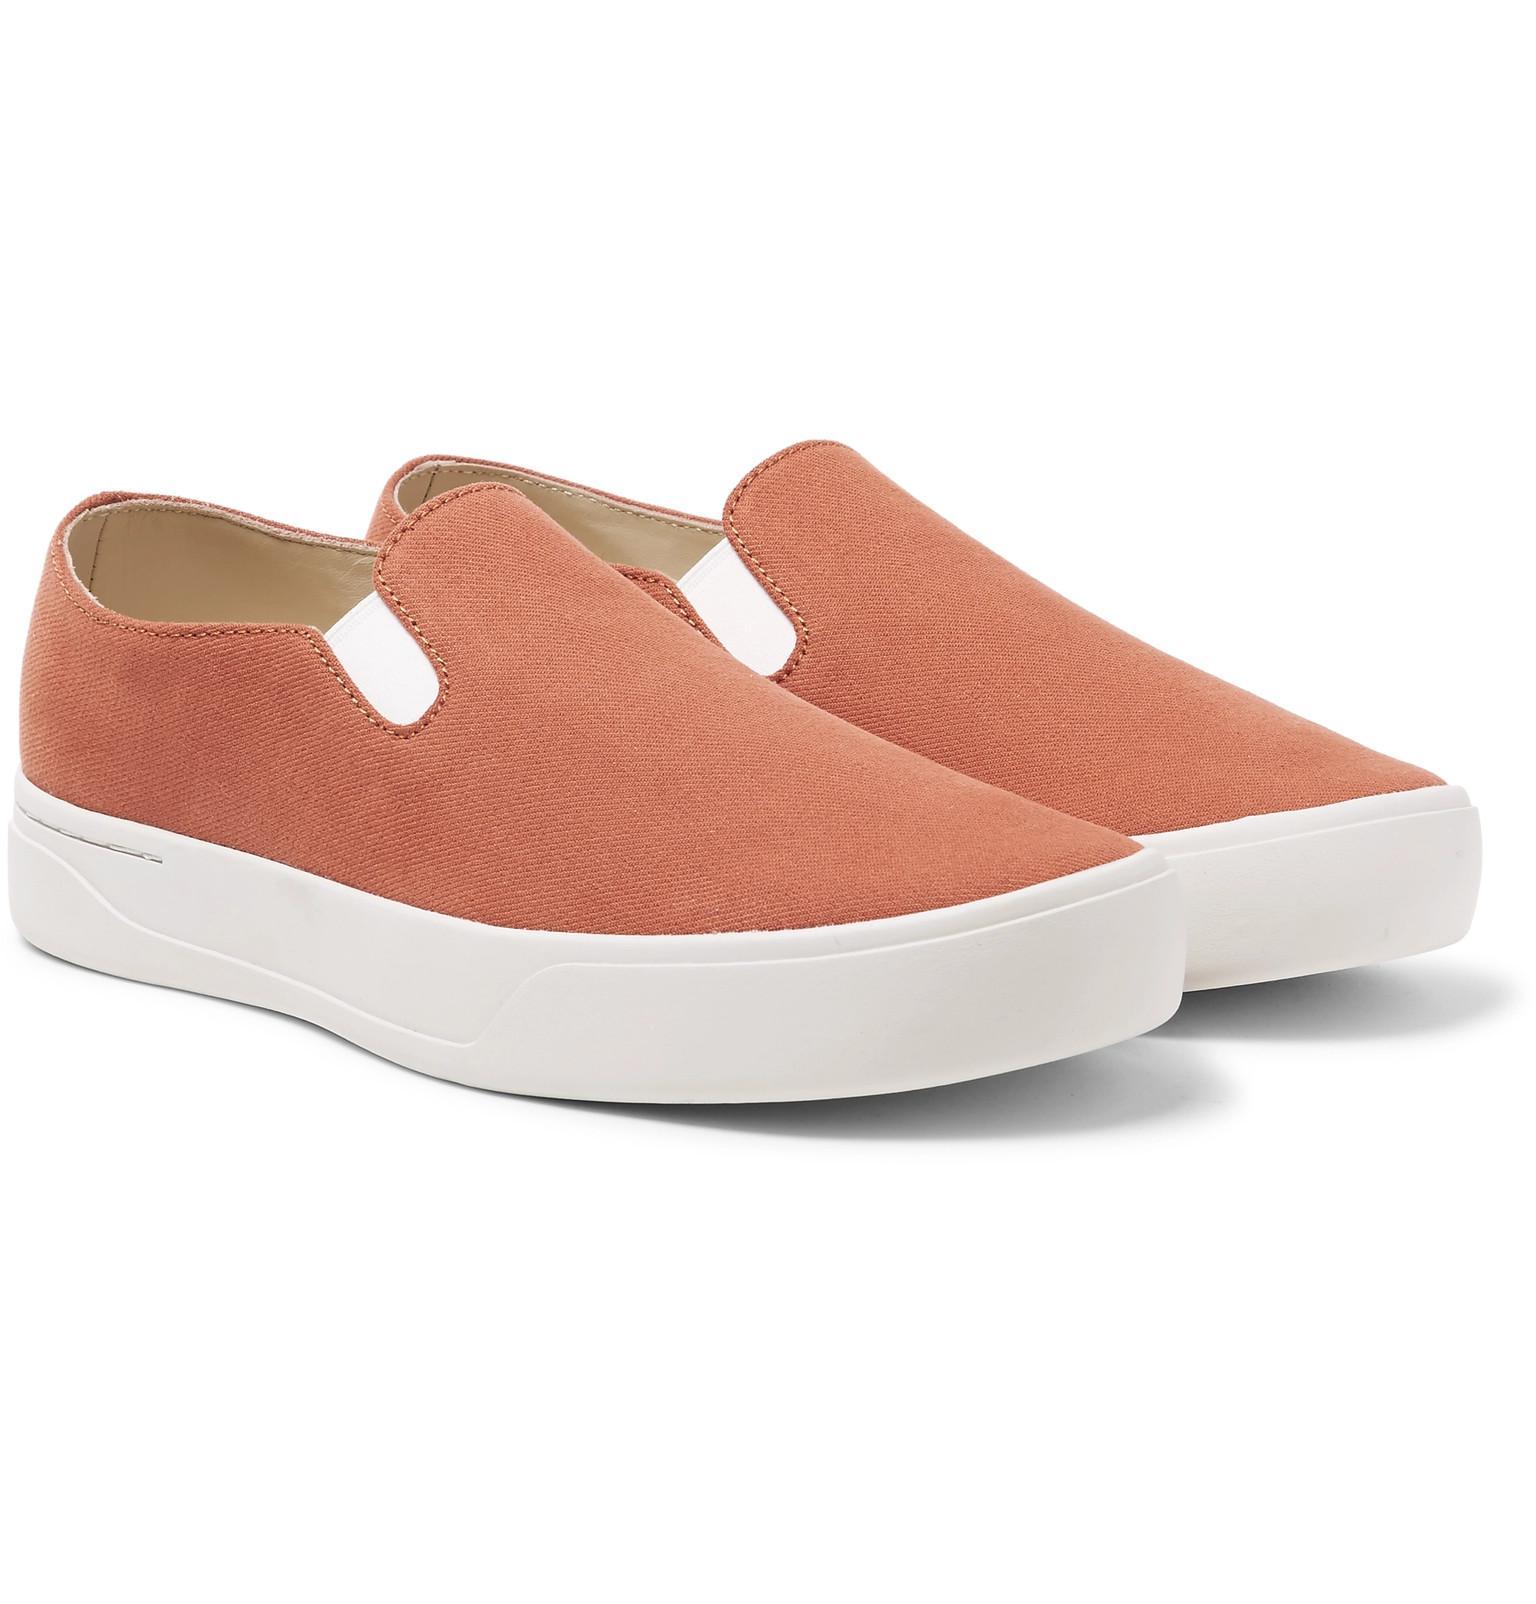 432e87573ae Lyst - Saturdays NYC Vass Twill Slip-on Sneakers in Orange for Men